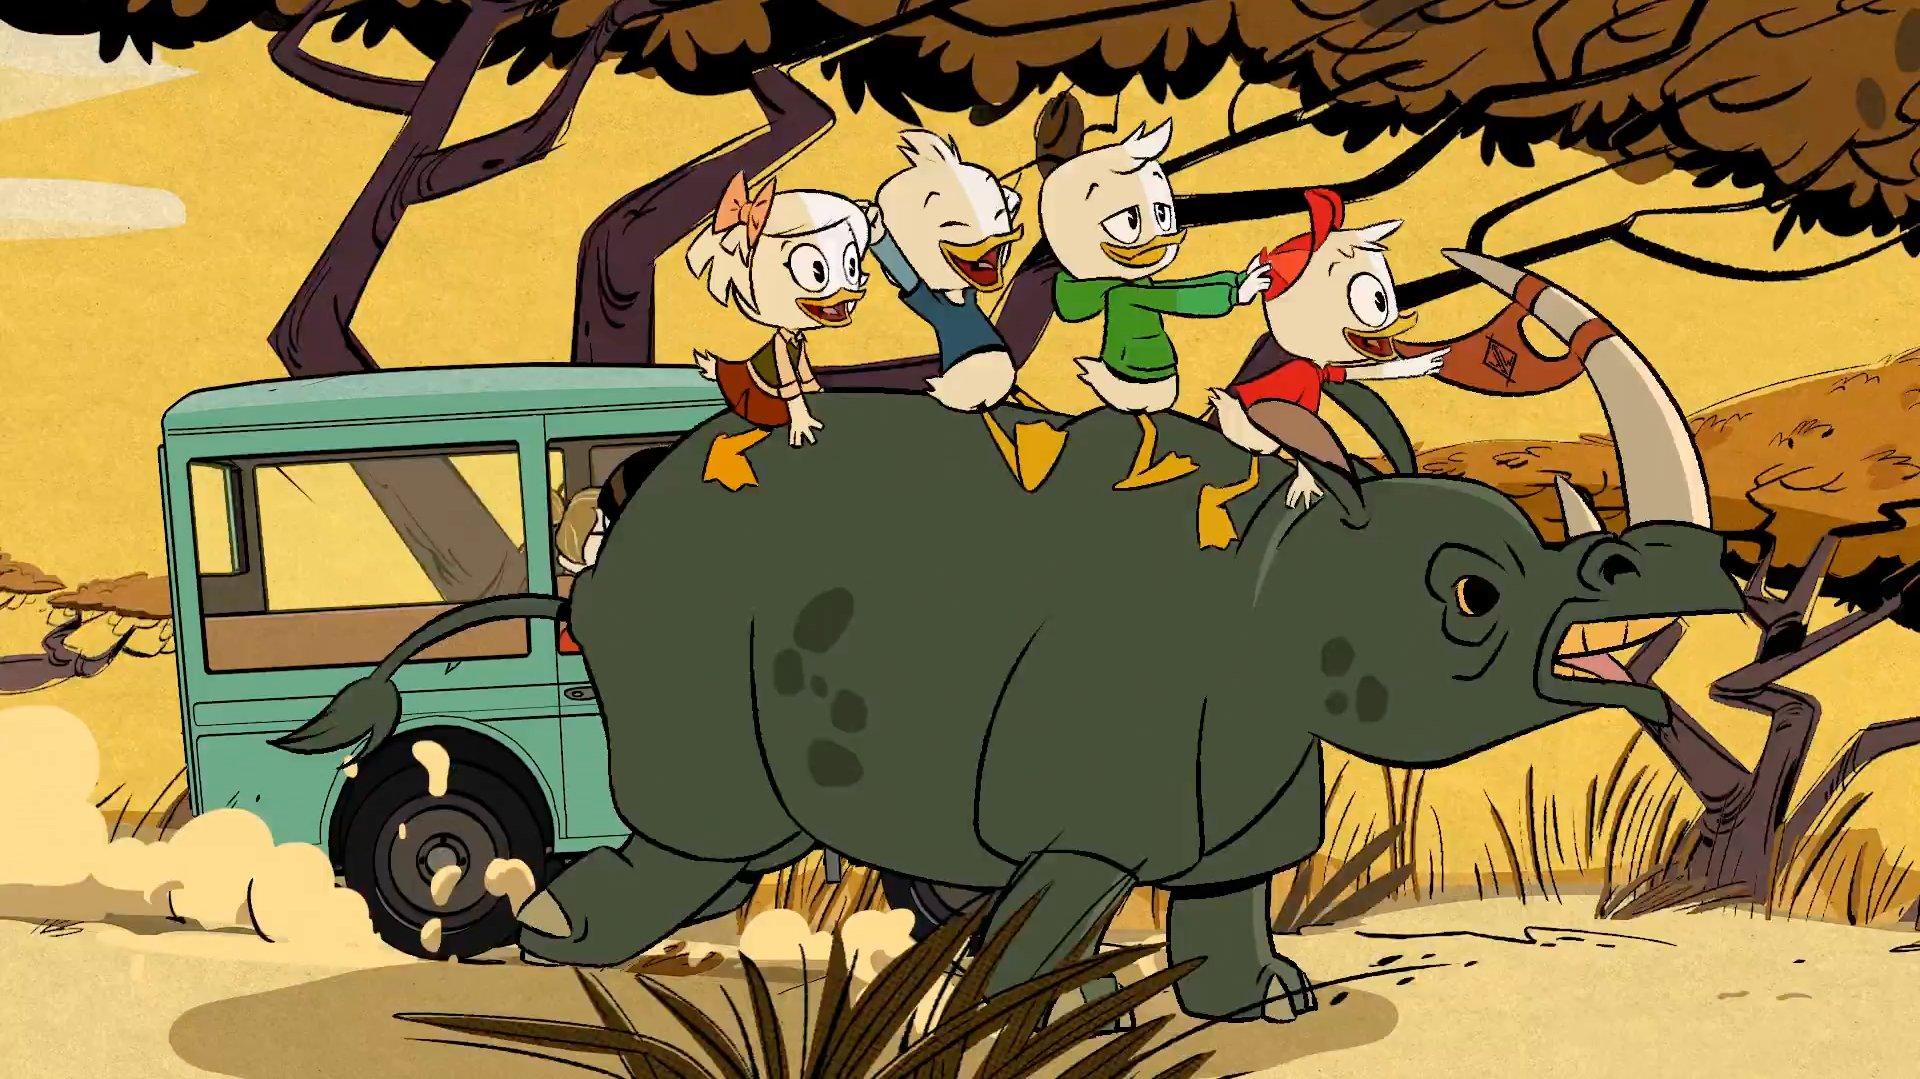 New DuckTales episodes return